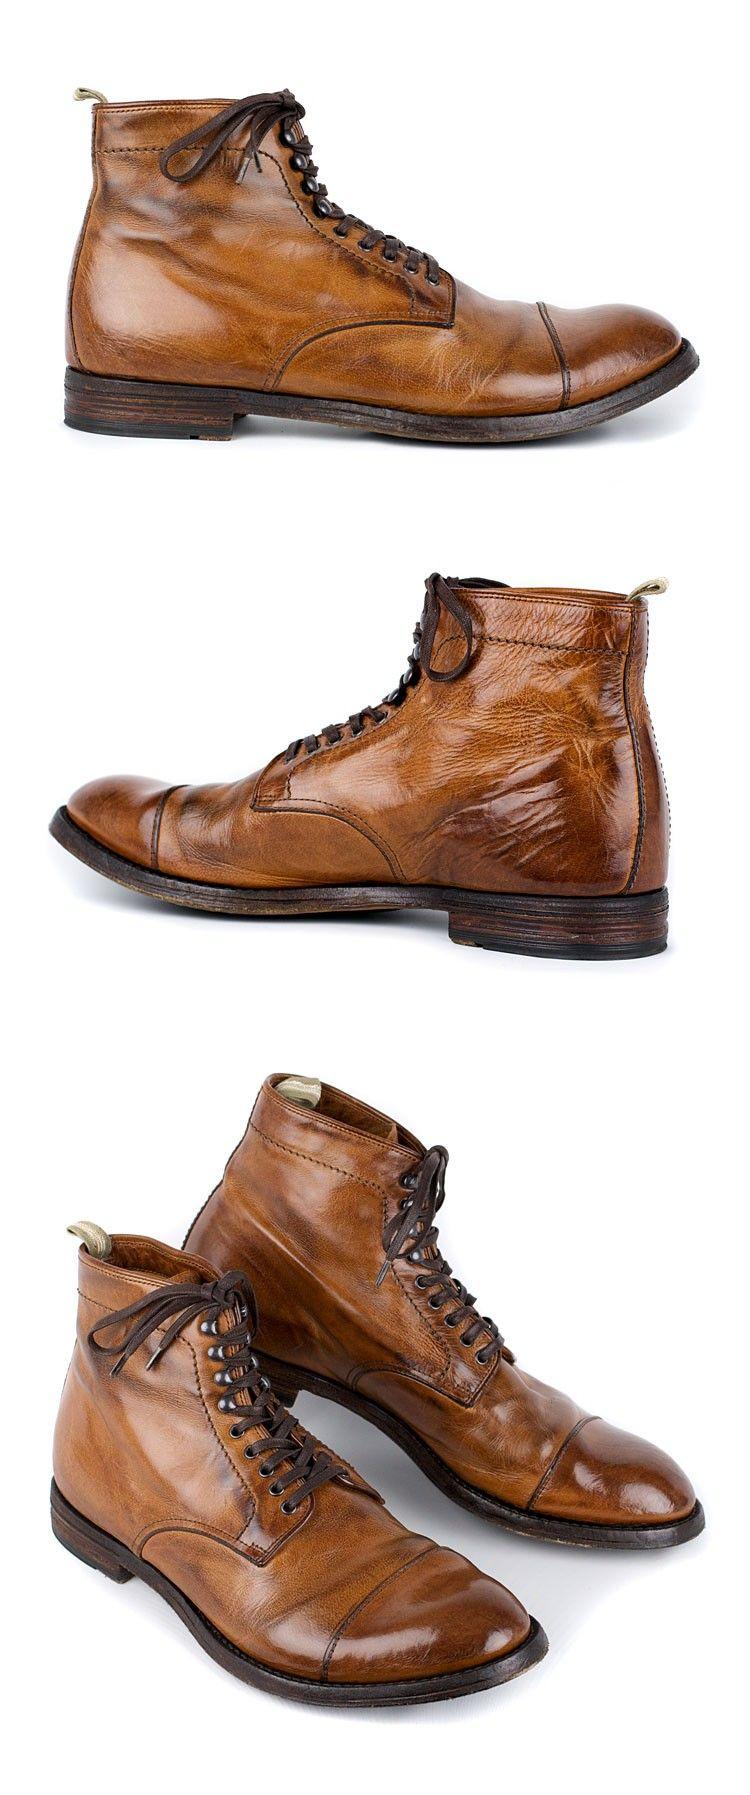 the best attitude b953a 2e982 Officine Creative Anatomia 16 Mens Lace-up Boot - Cognac  resoul.com